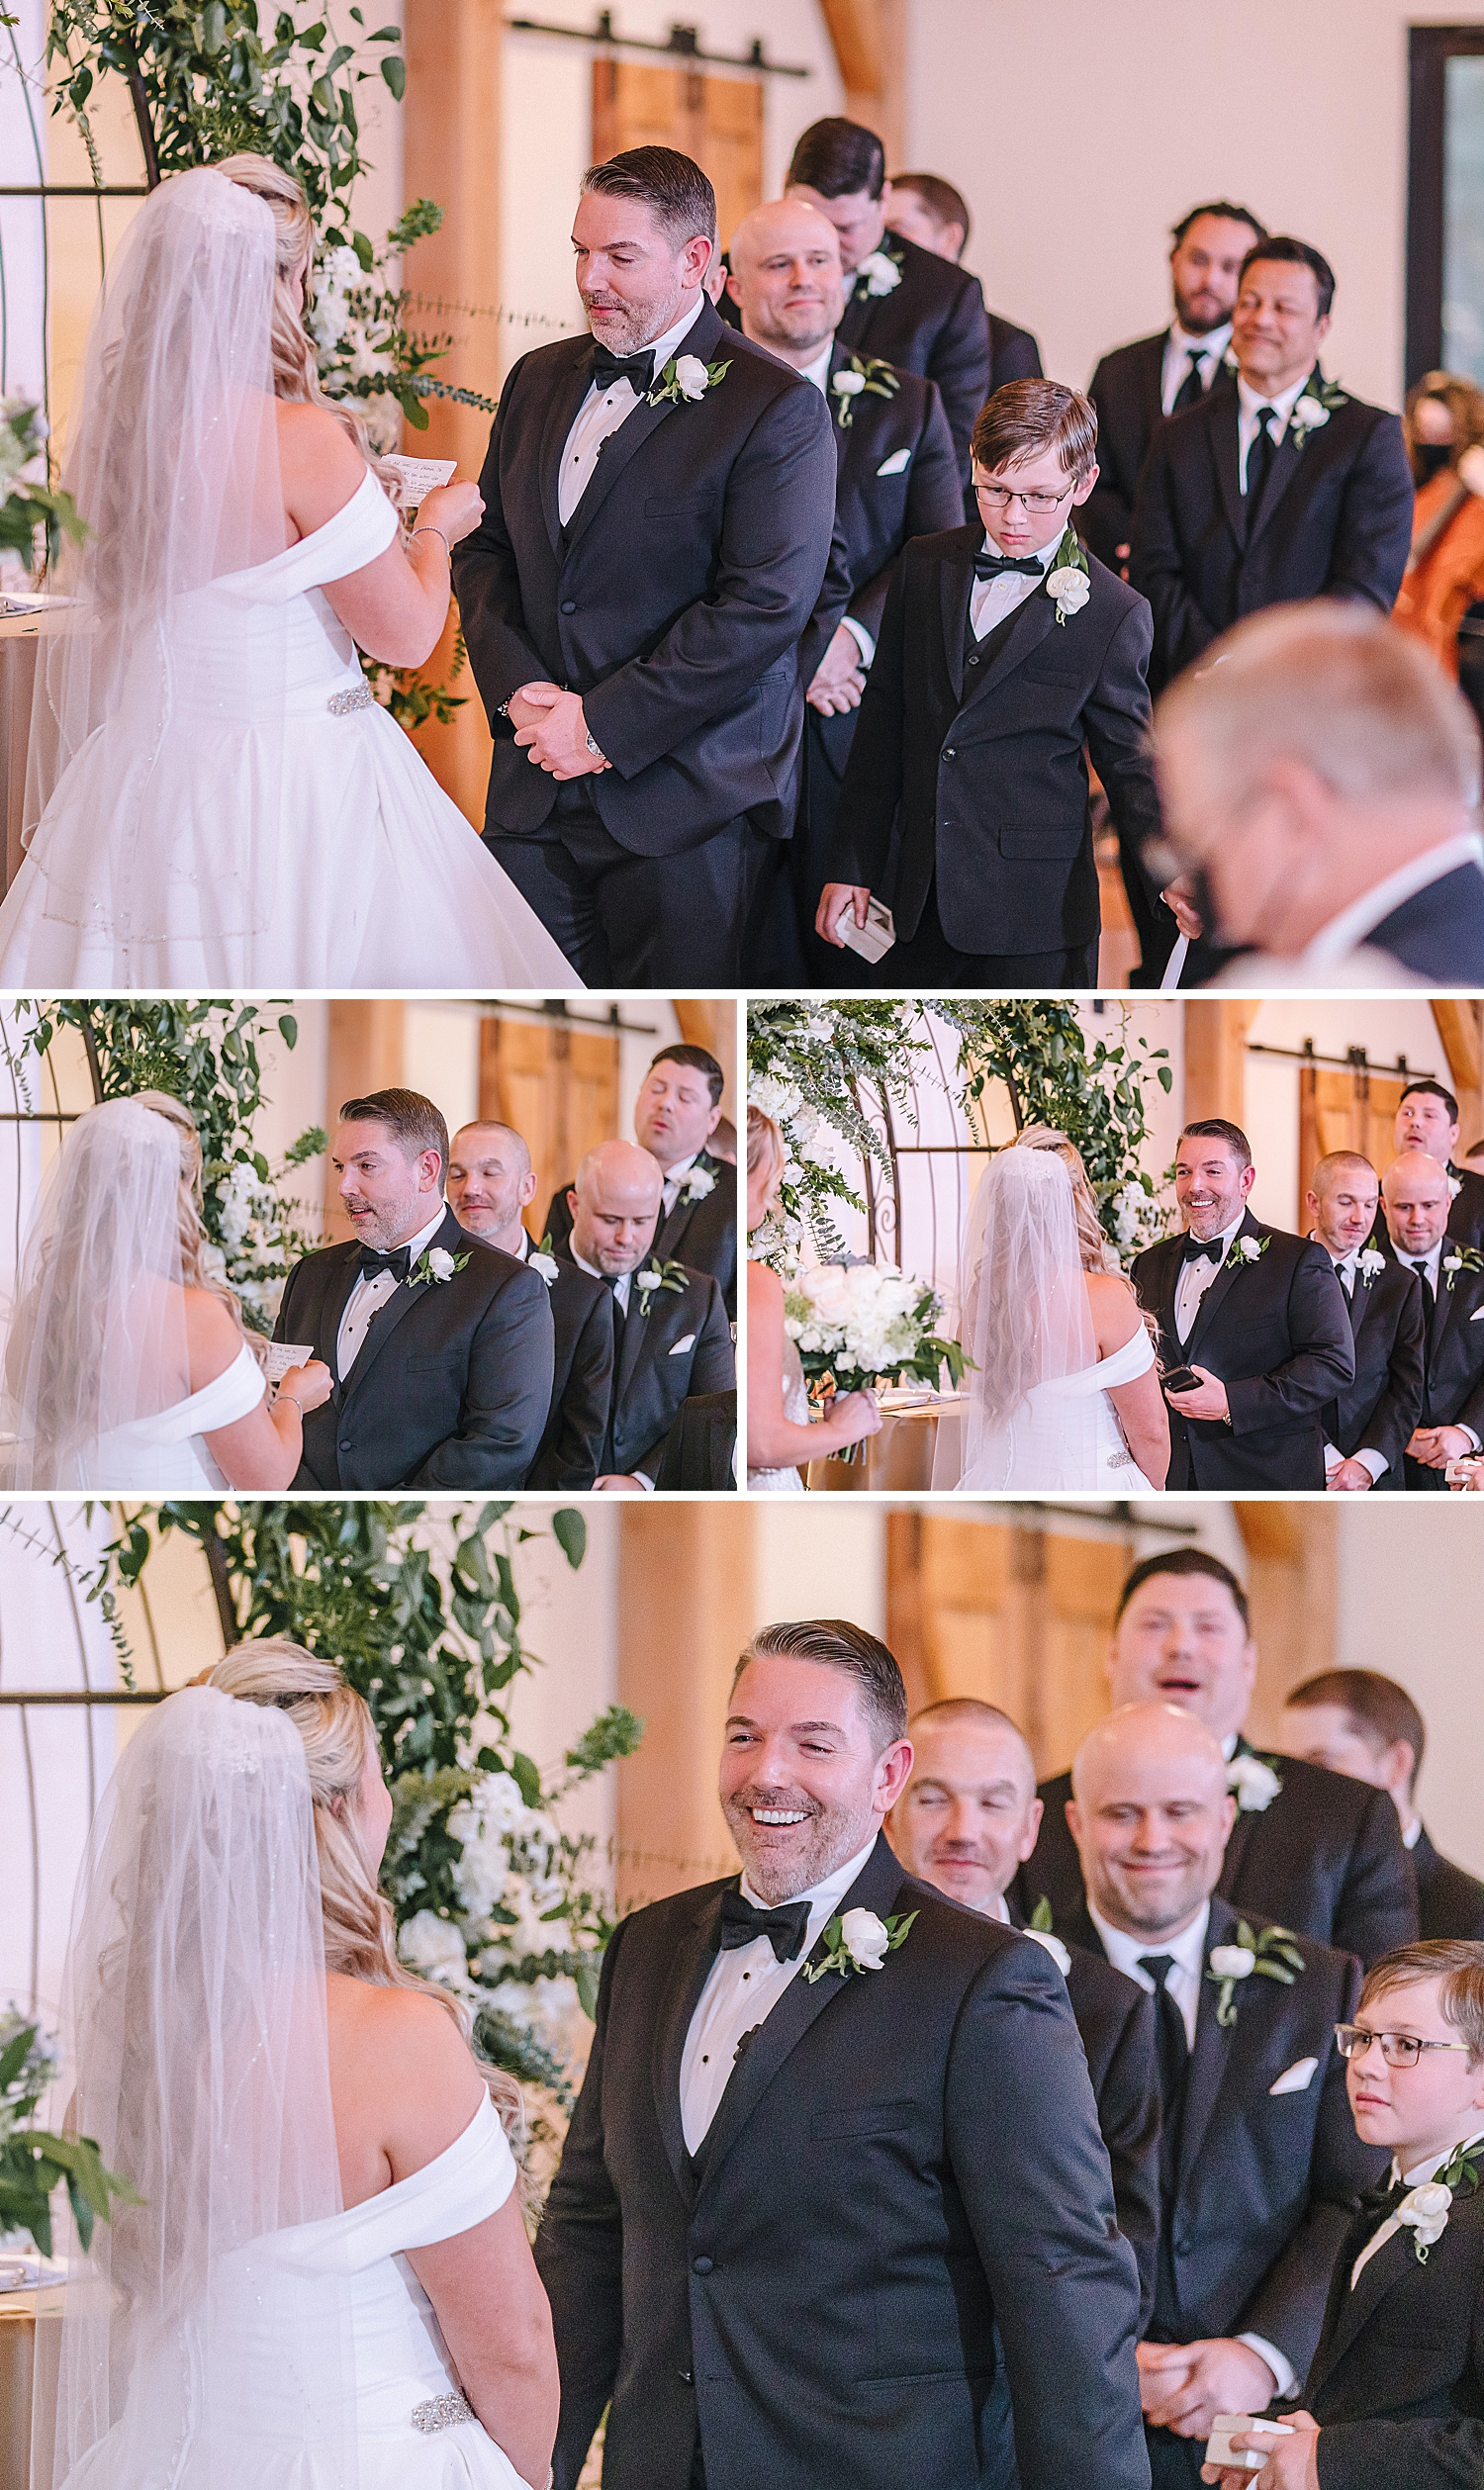 Magnolia-Halle-Wedding-San-Antonio-Texas-Bride-Grom_0064.jpg